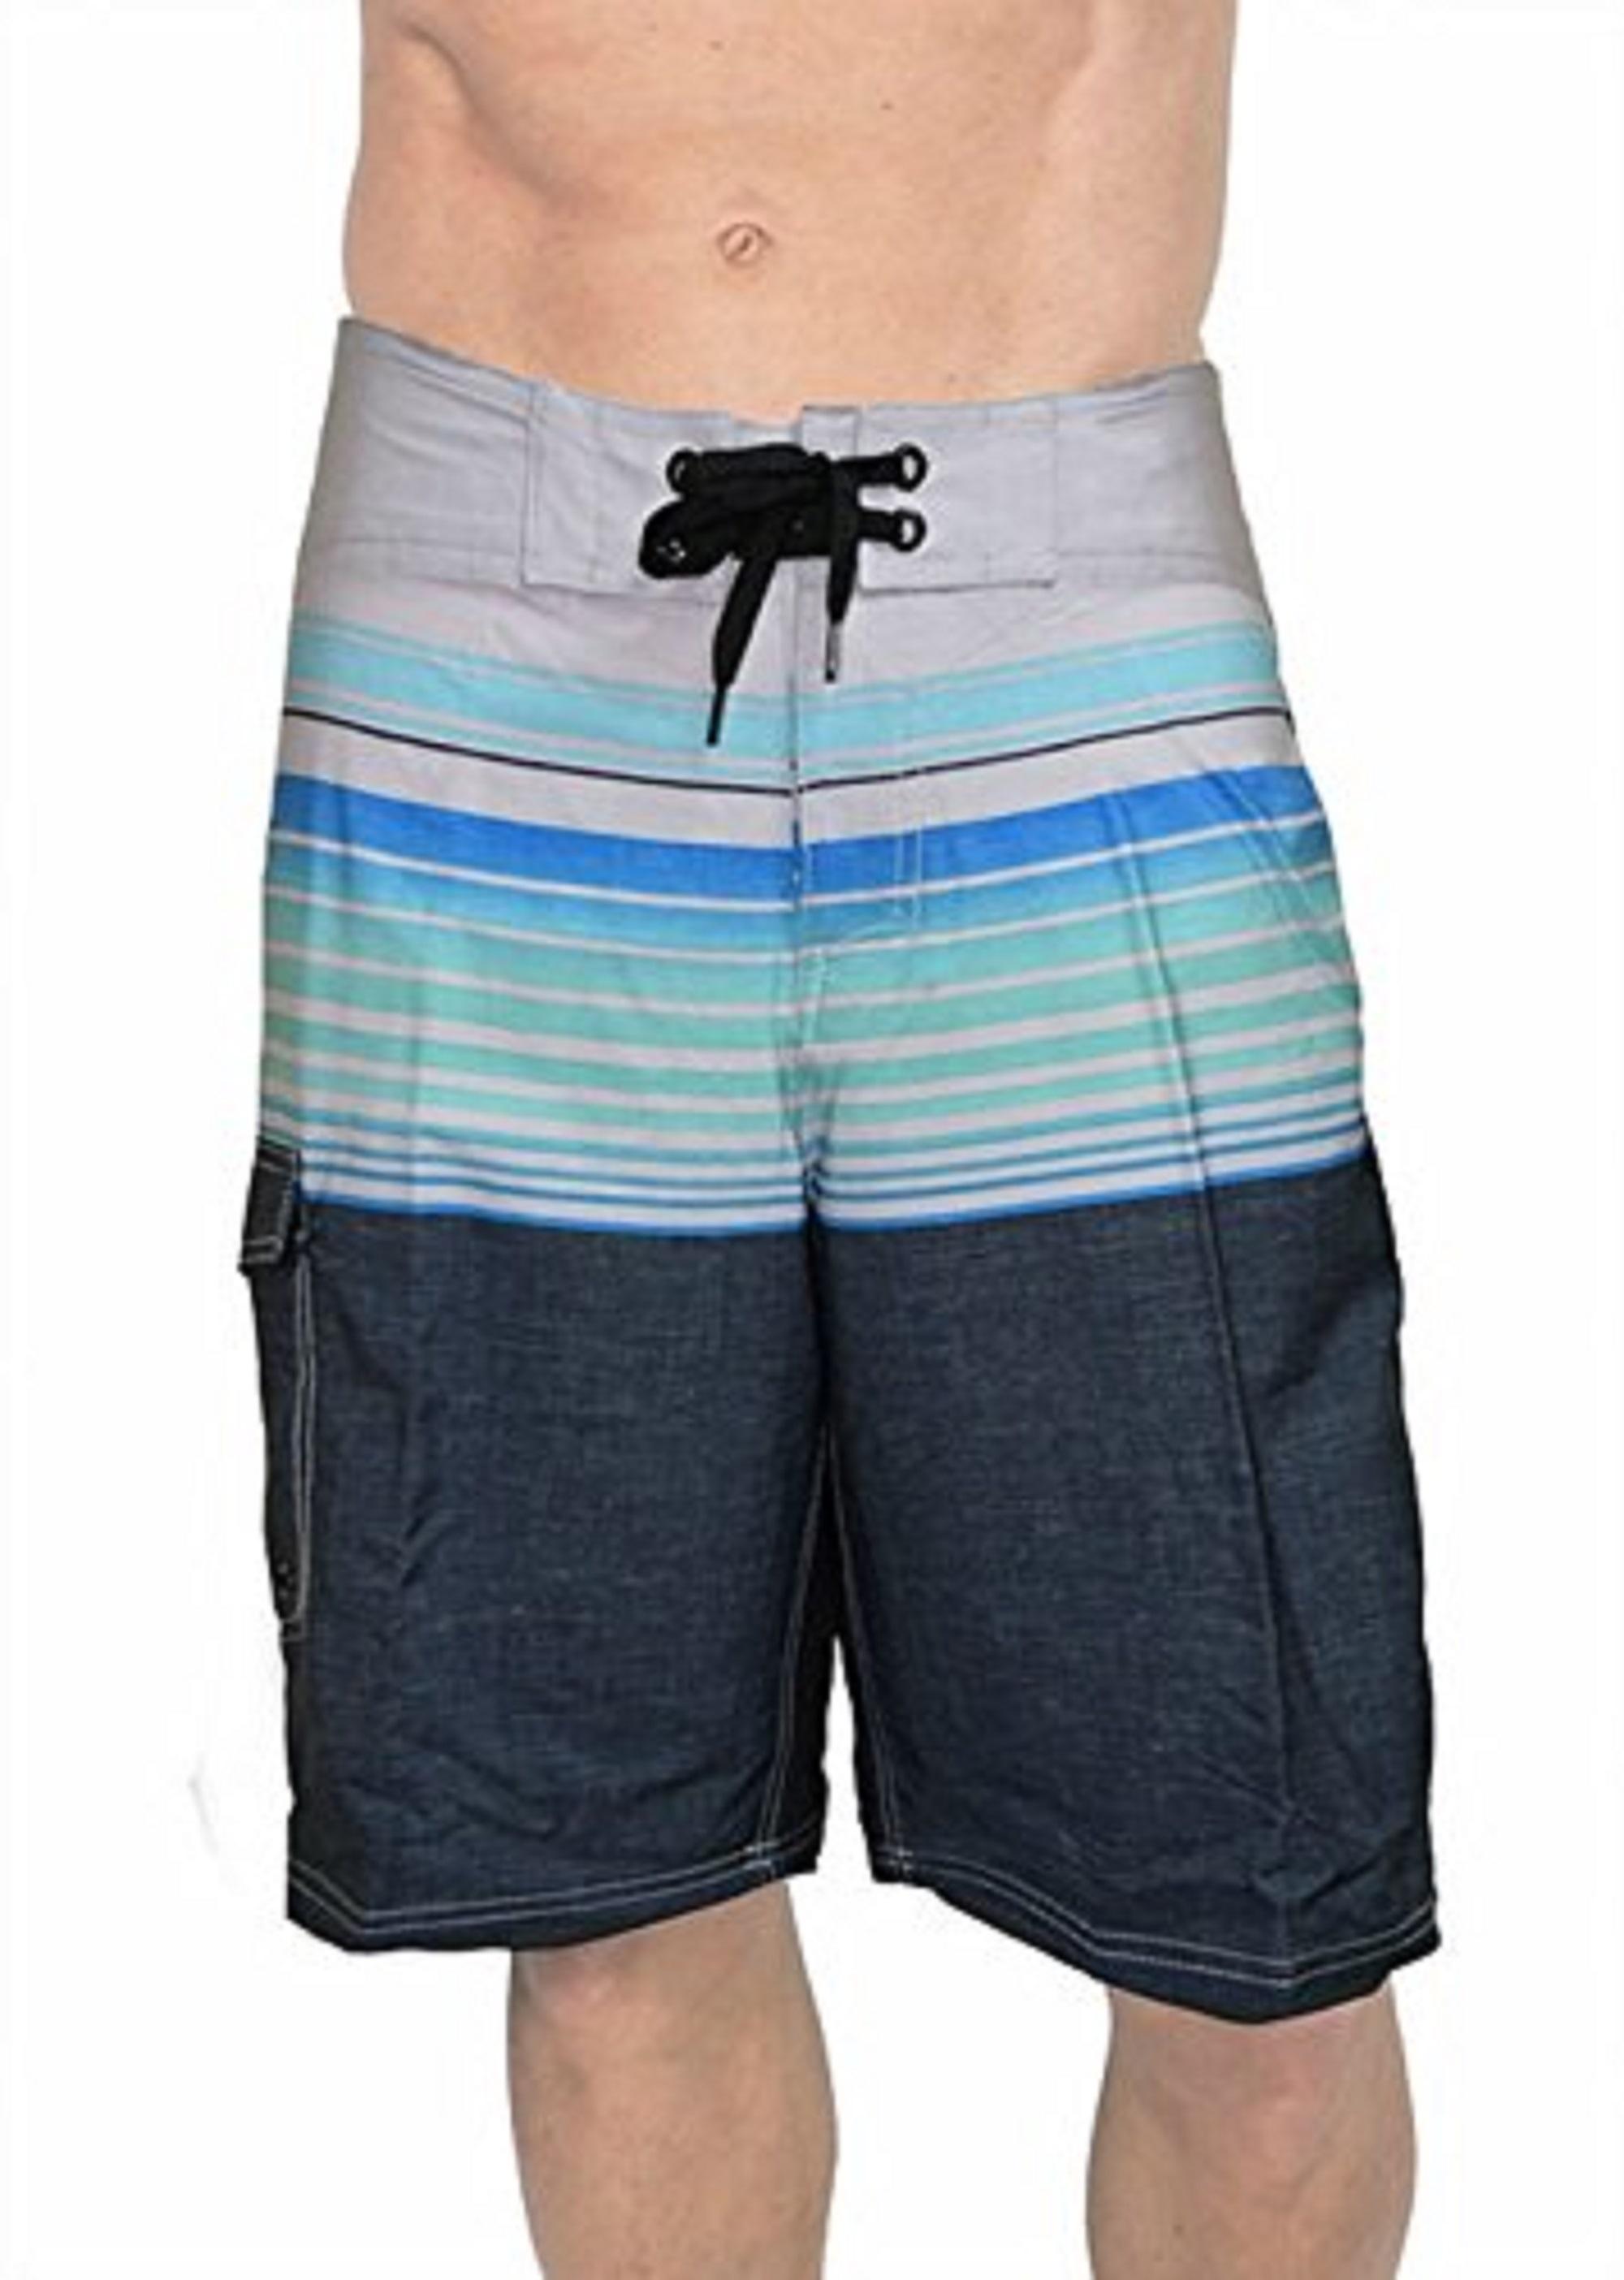 Banana Boat Men's Boardshorts UPF 50+ Fabric Is Made To Block 99% Of The UVA Rays. Size Runs Small, Order Up a Size. (X-Large, Aqua 2-Tone 507)